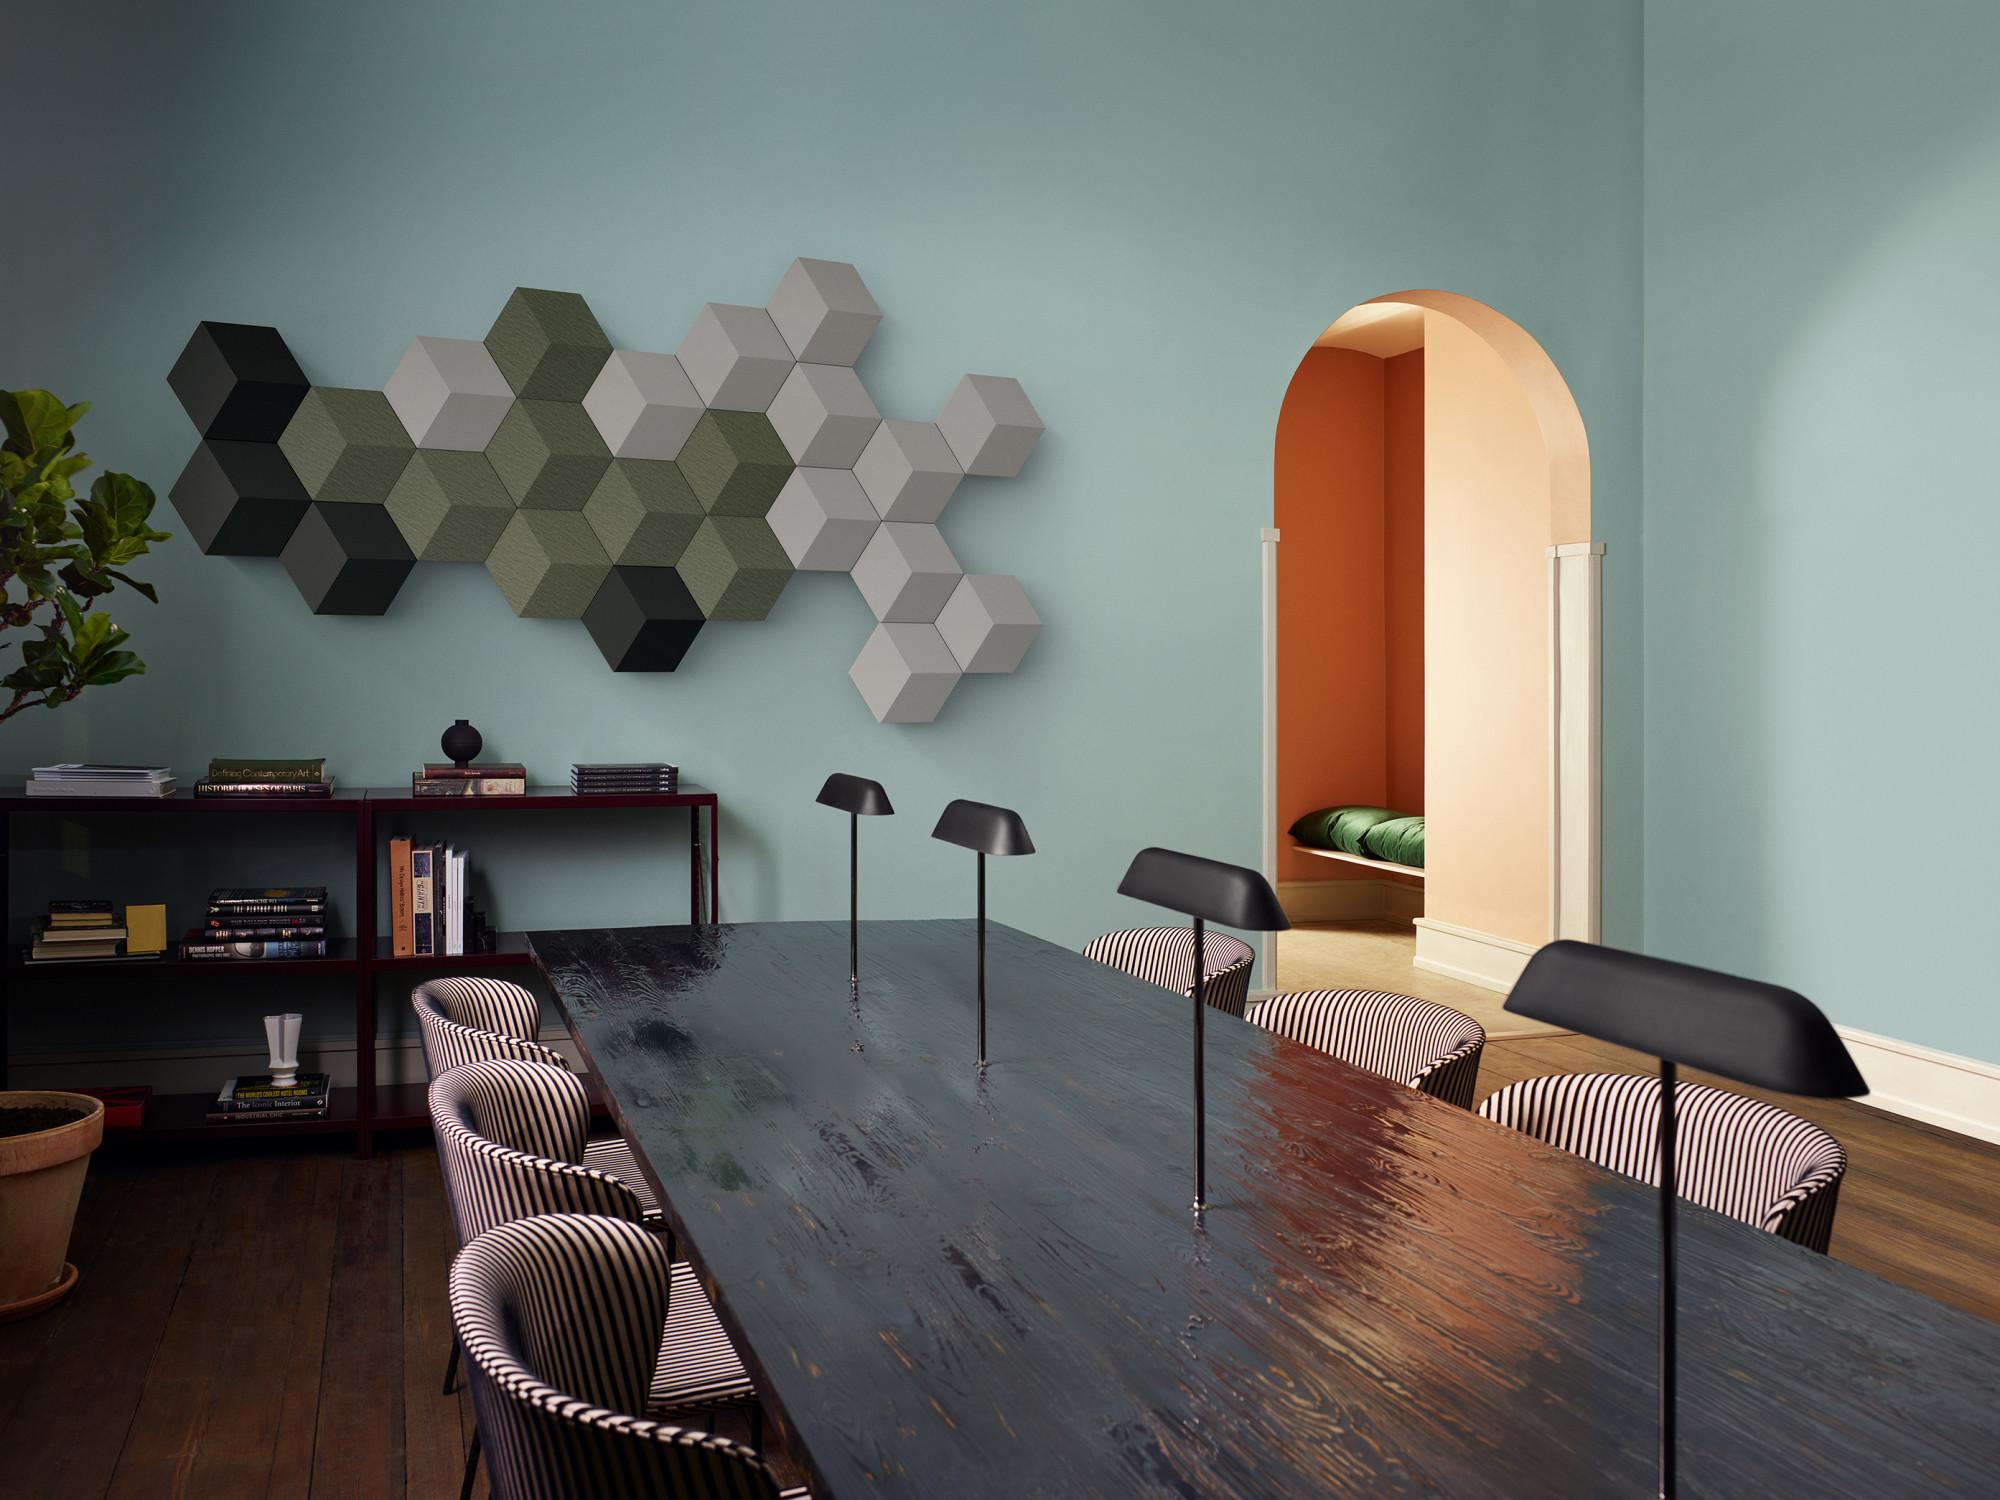 klangsystem f r die wand akustik news produkte baunetz wissen. Black Bedroom Furniture Sets. Home Design Ideas